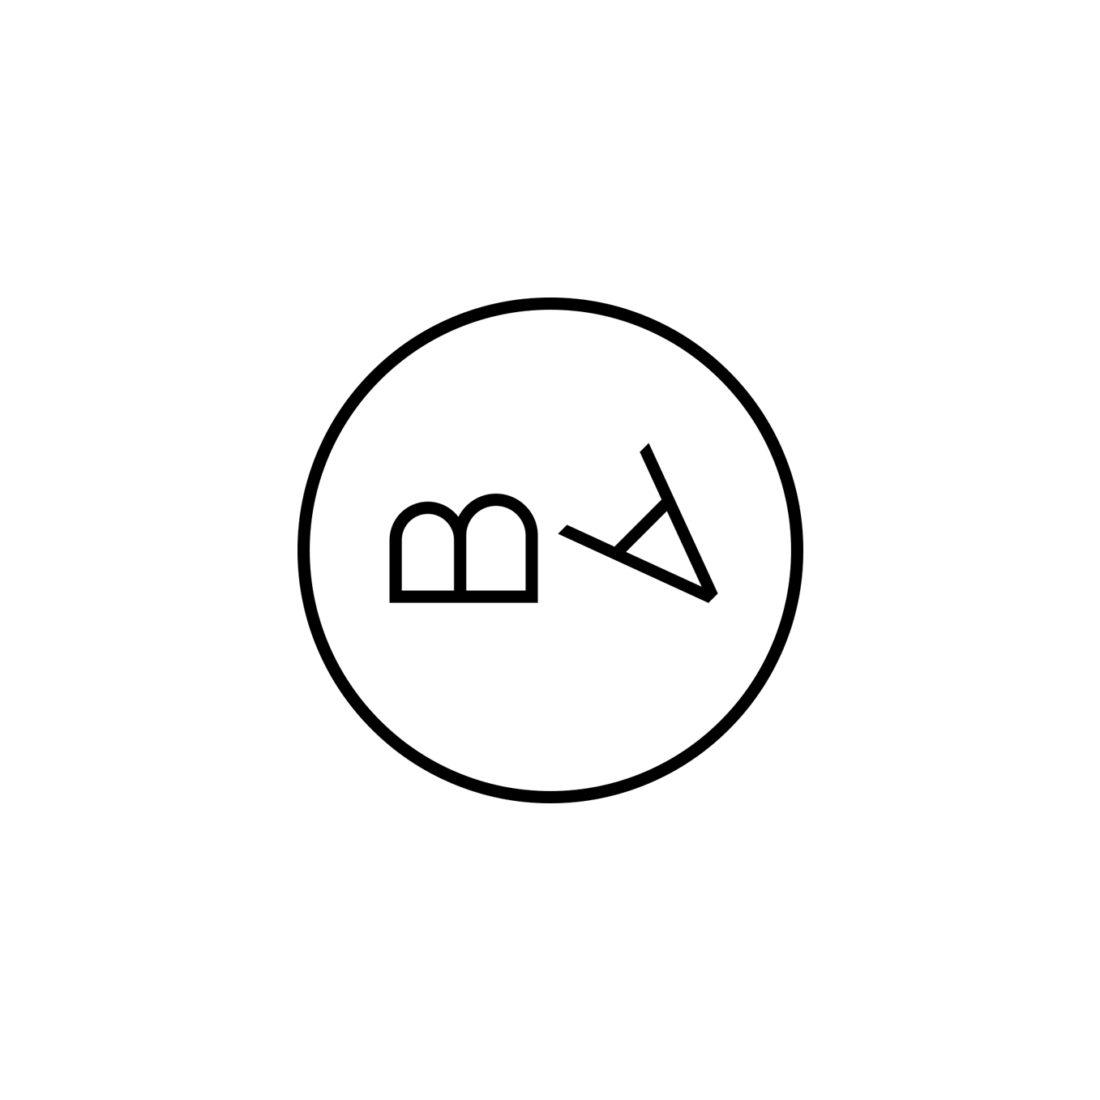 blank_symbol_170306_211915